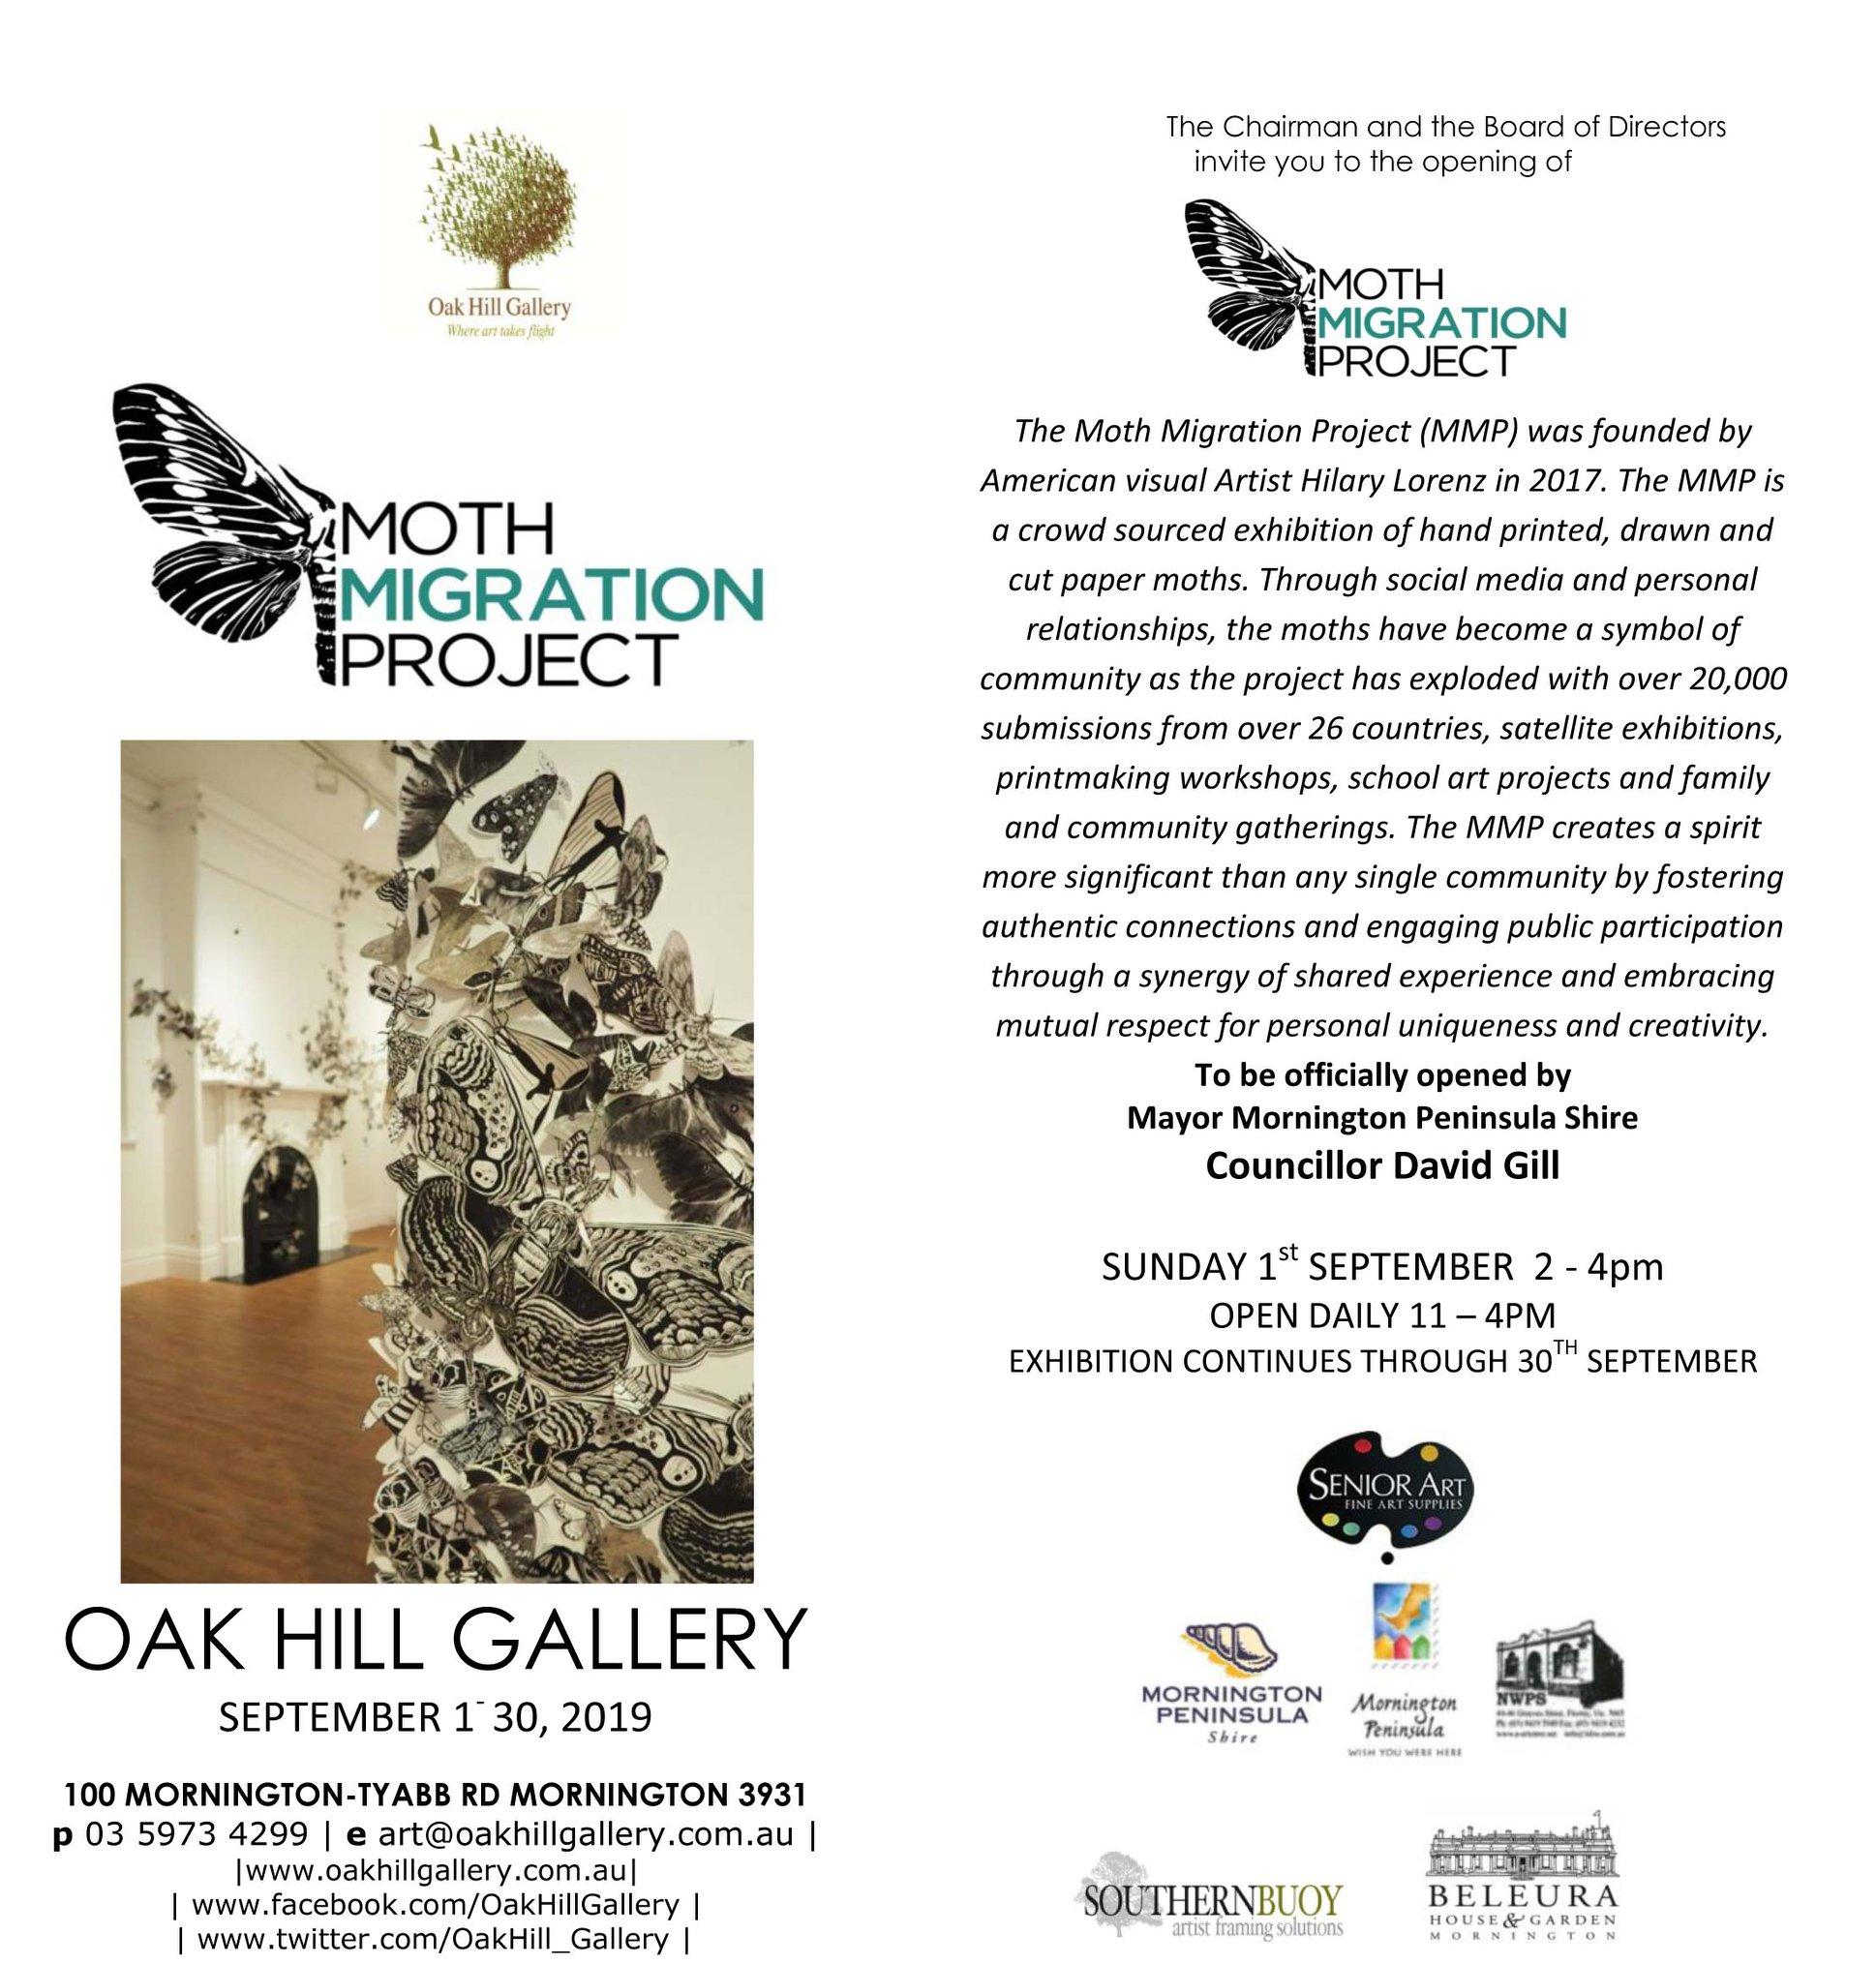 Hilary_lorenz_Moth+Migration_Project_Oak_Hill_Gallery